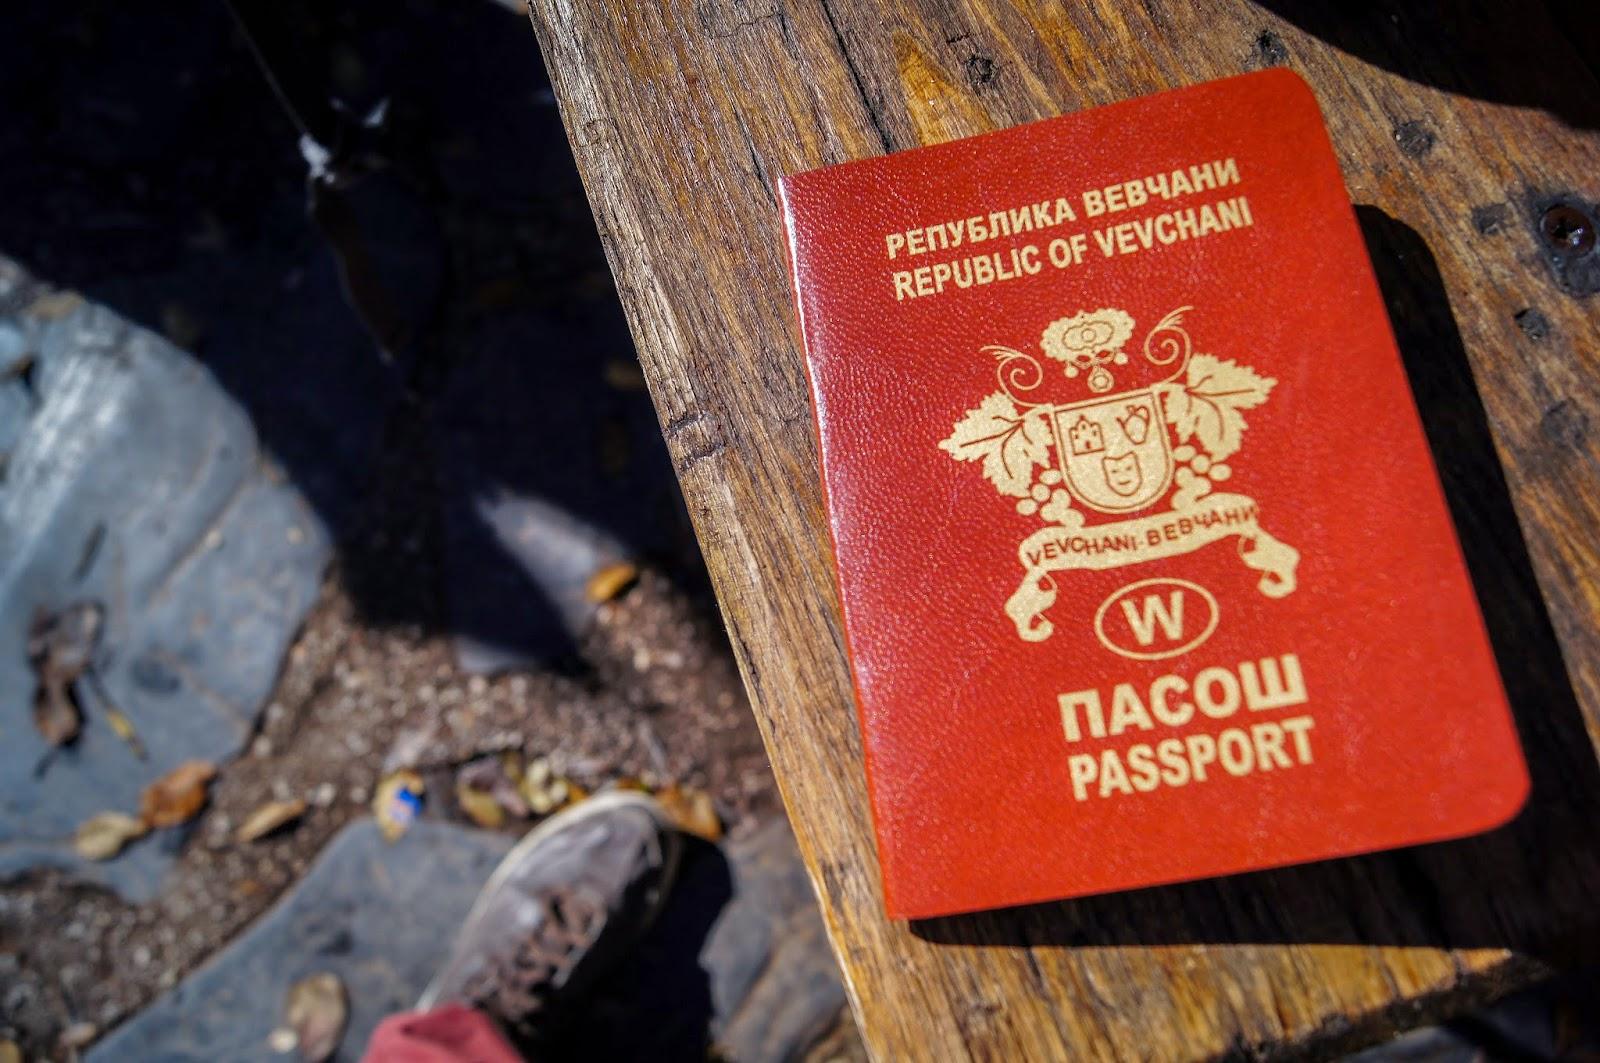 Pasaporte de Vevchani